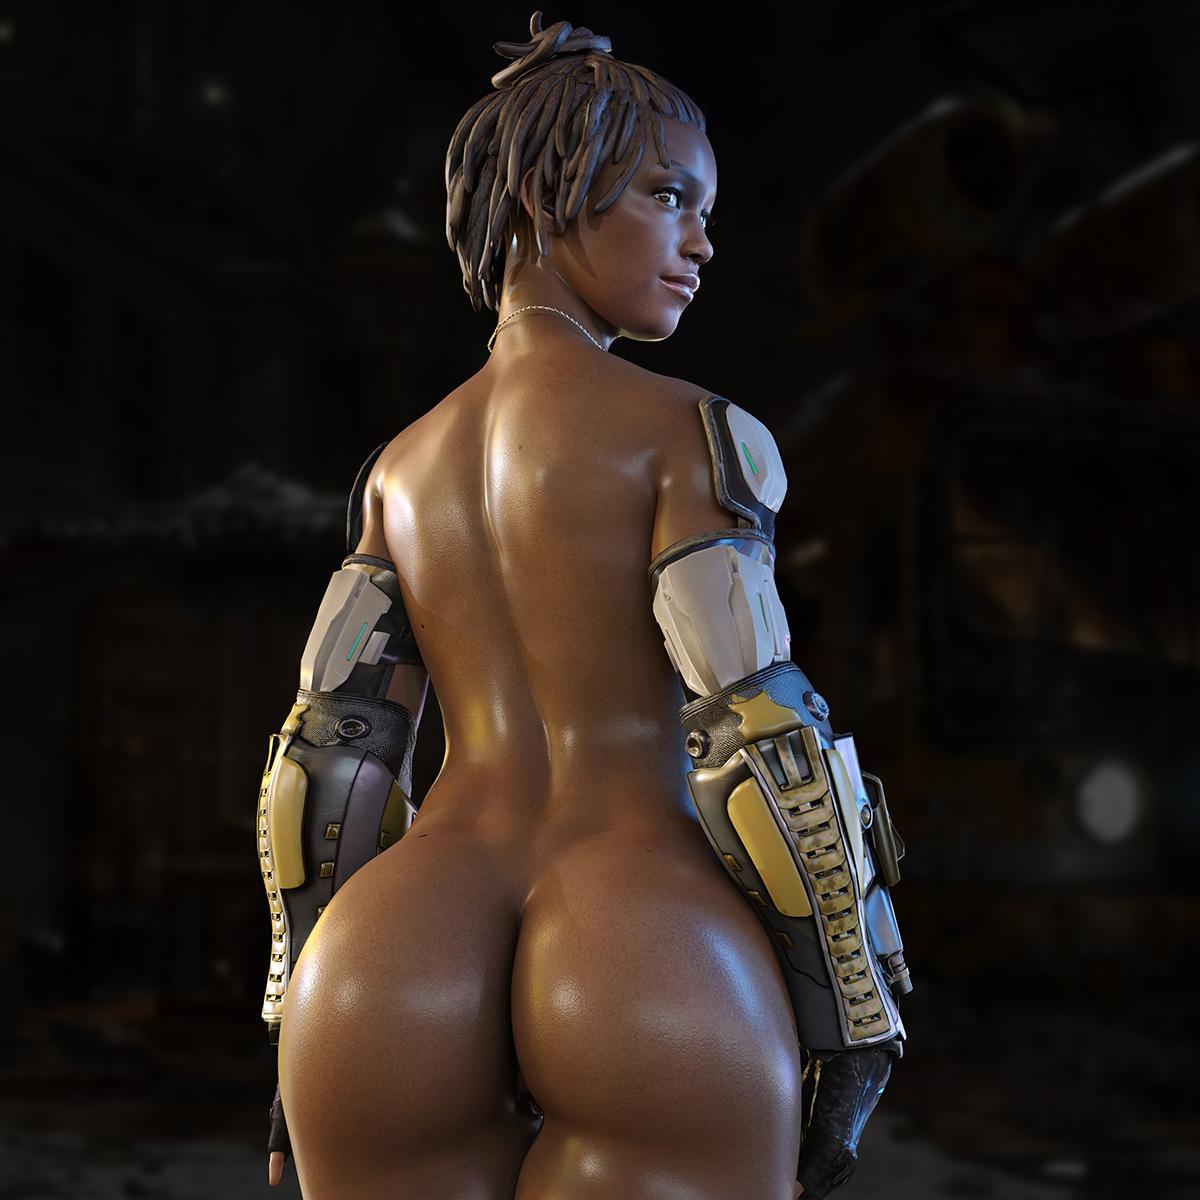 Jacqui Briggs (Ass) - Mortal Kombat 11